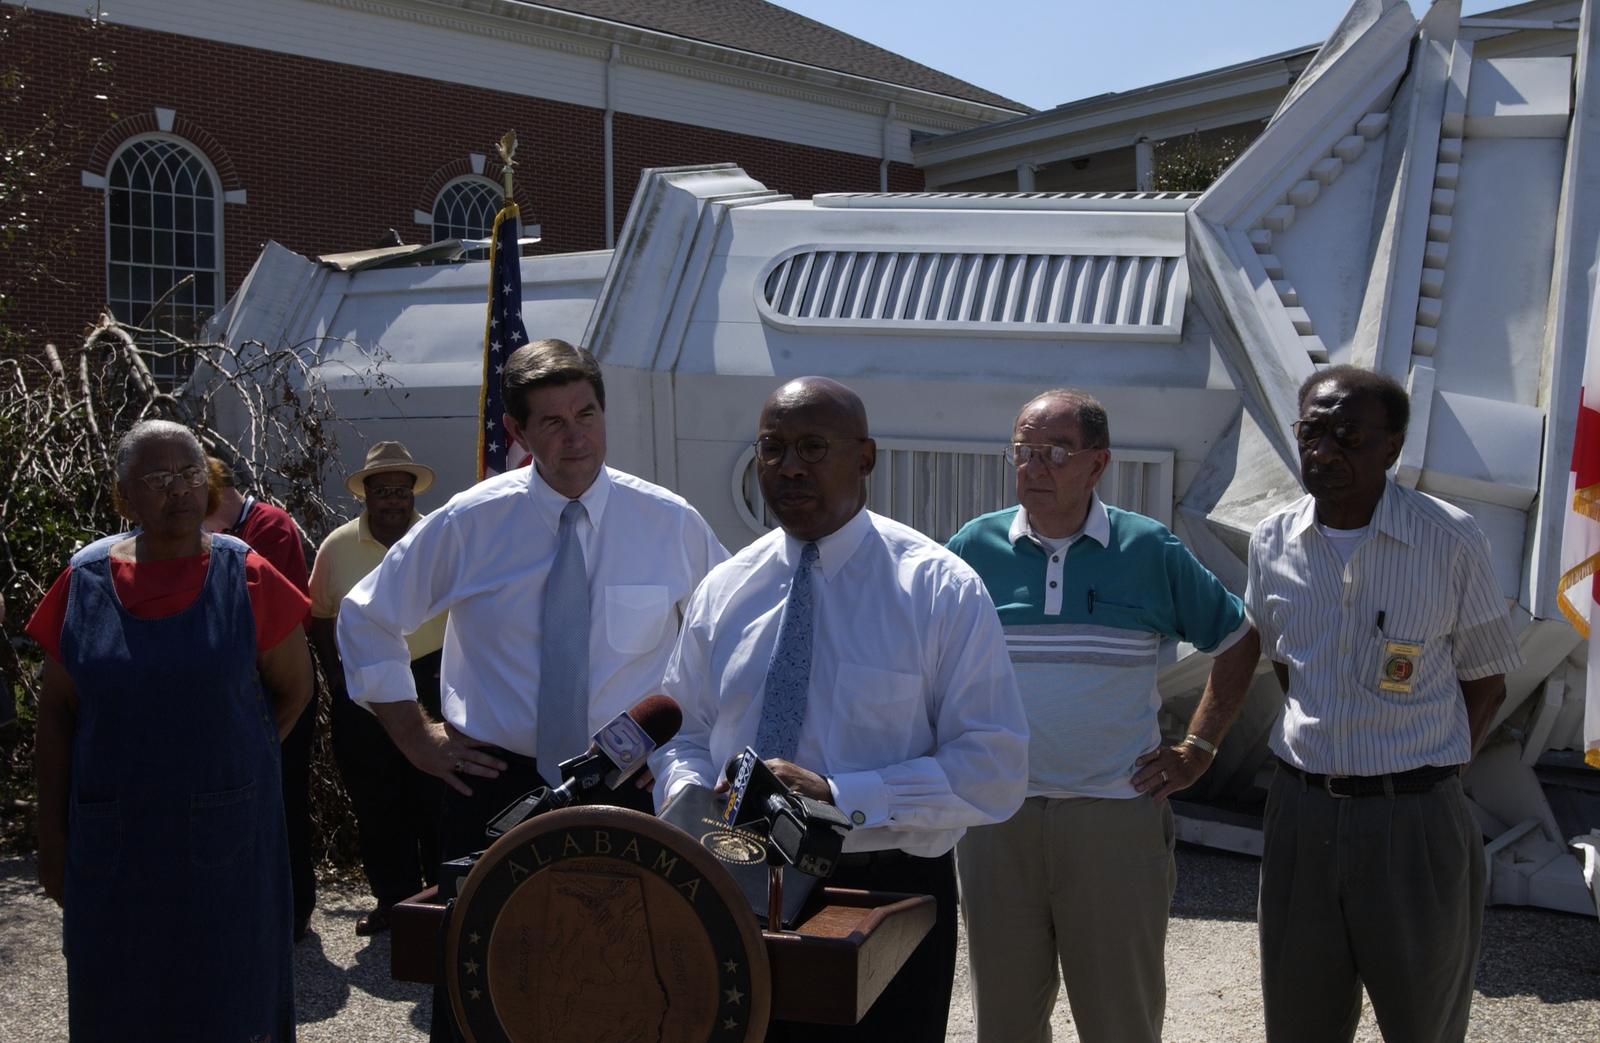 Hurricane Ivan,  Alabama. [Damage, cleanup, rebuilding;  Secretary Alphonso Jackson,  Alabama Governor Bob Riley meeting with residents.]